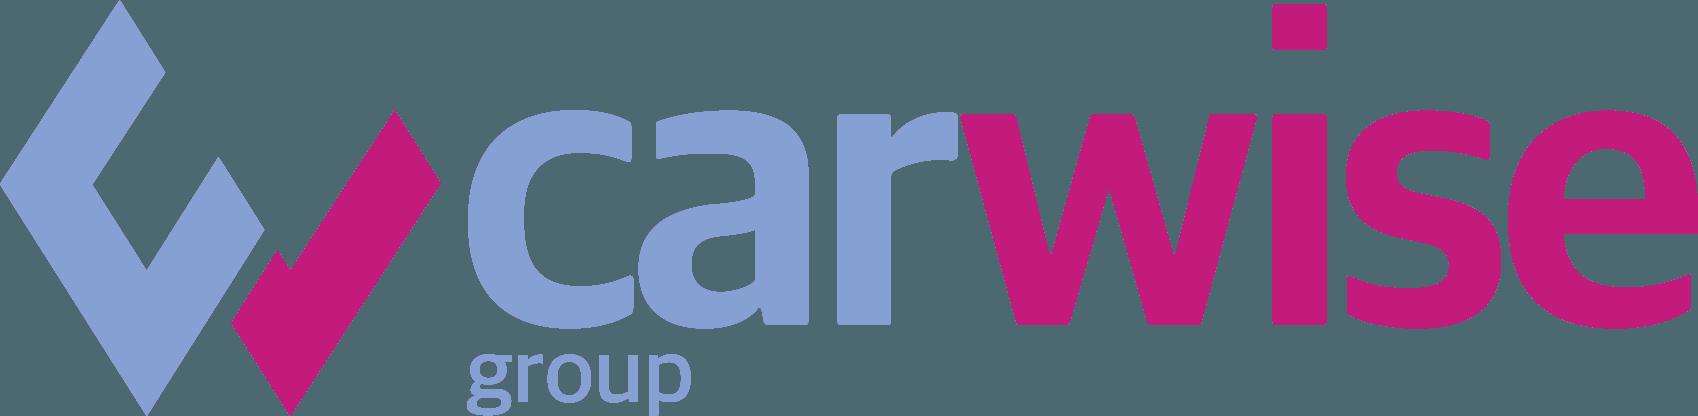 Vanwise Group